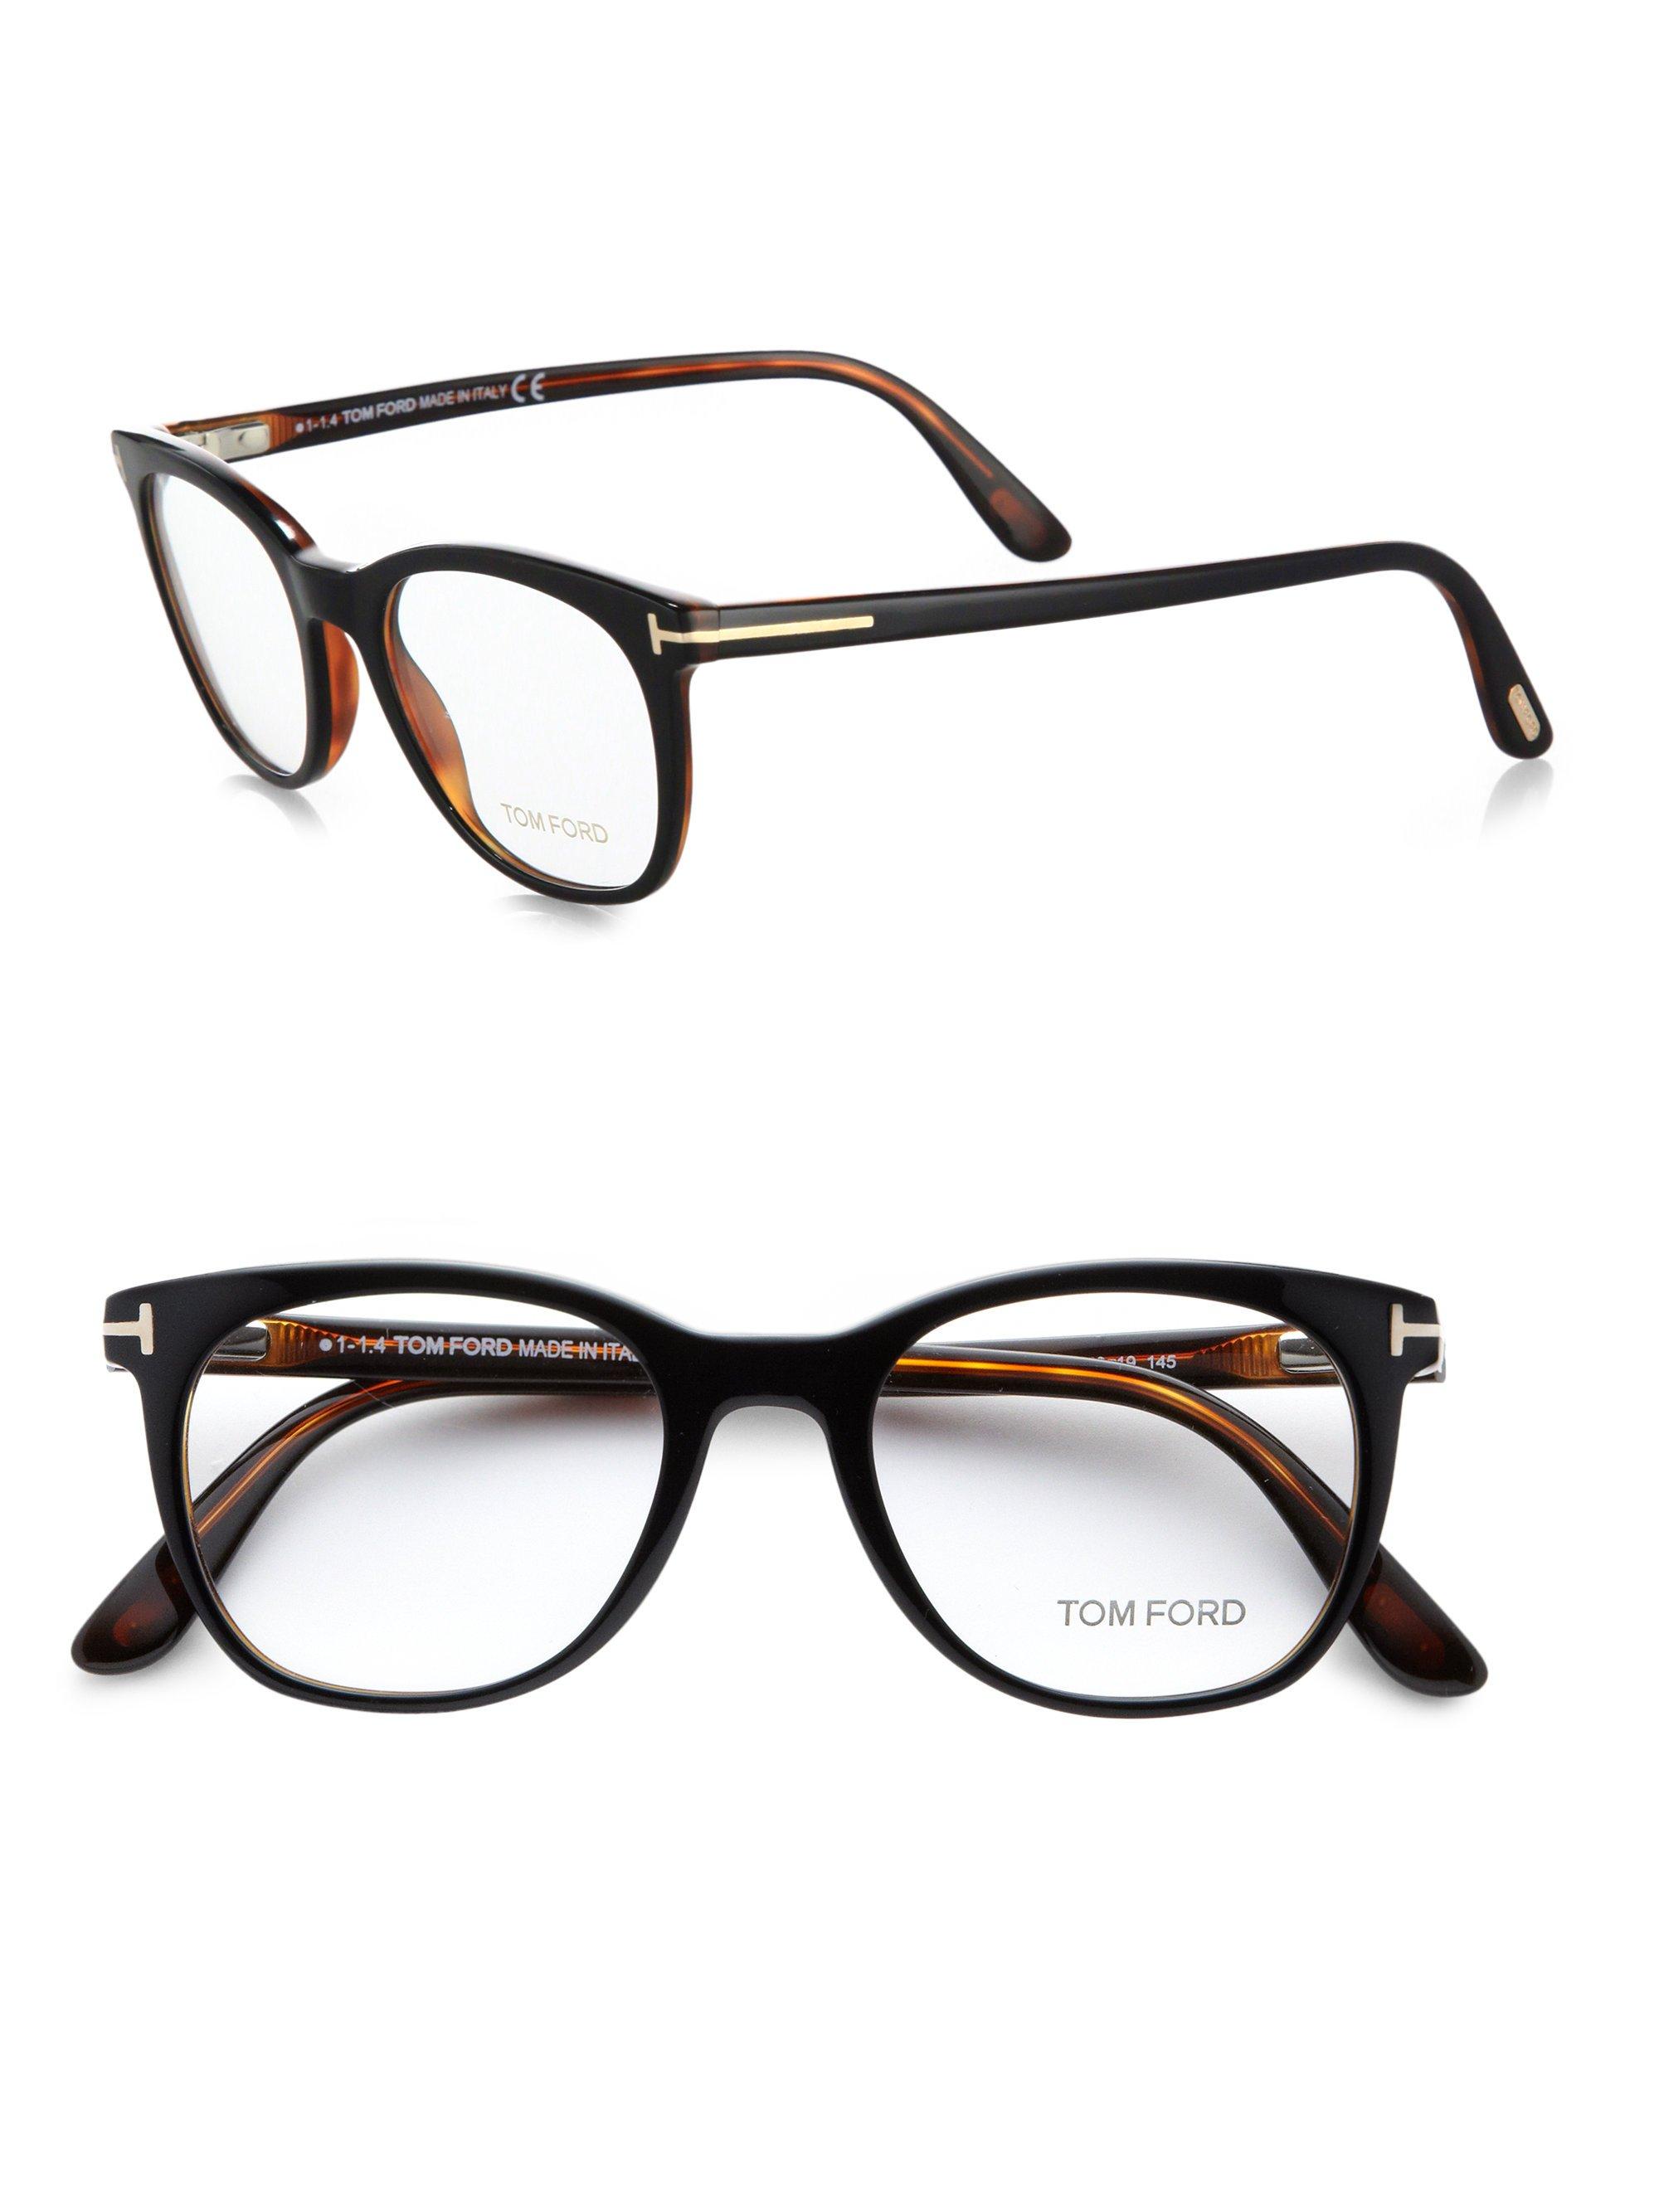 bdadcfed84ba3 Tom Ford 5310 Rounded Optical Frames in Black for Men - Lyst